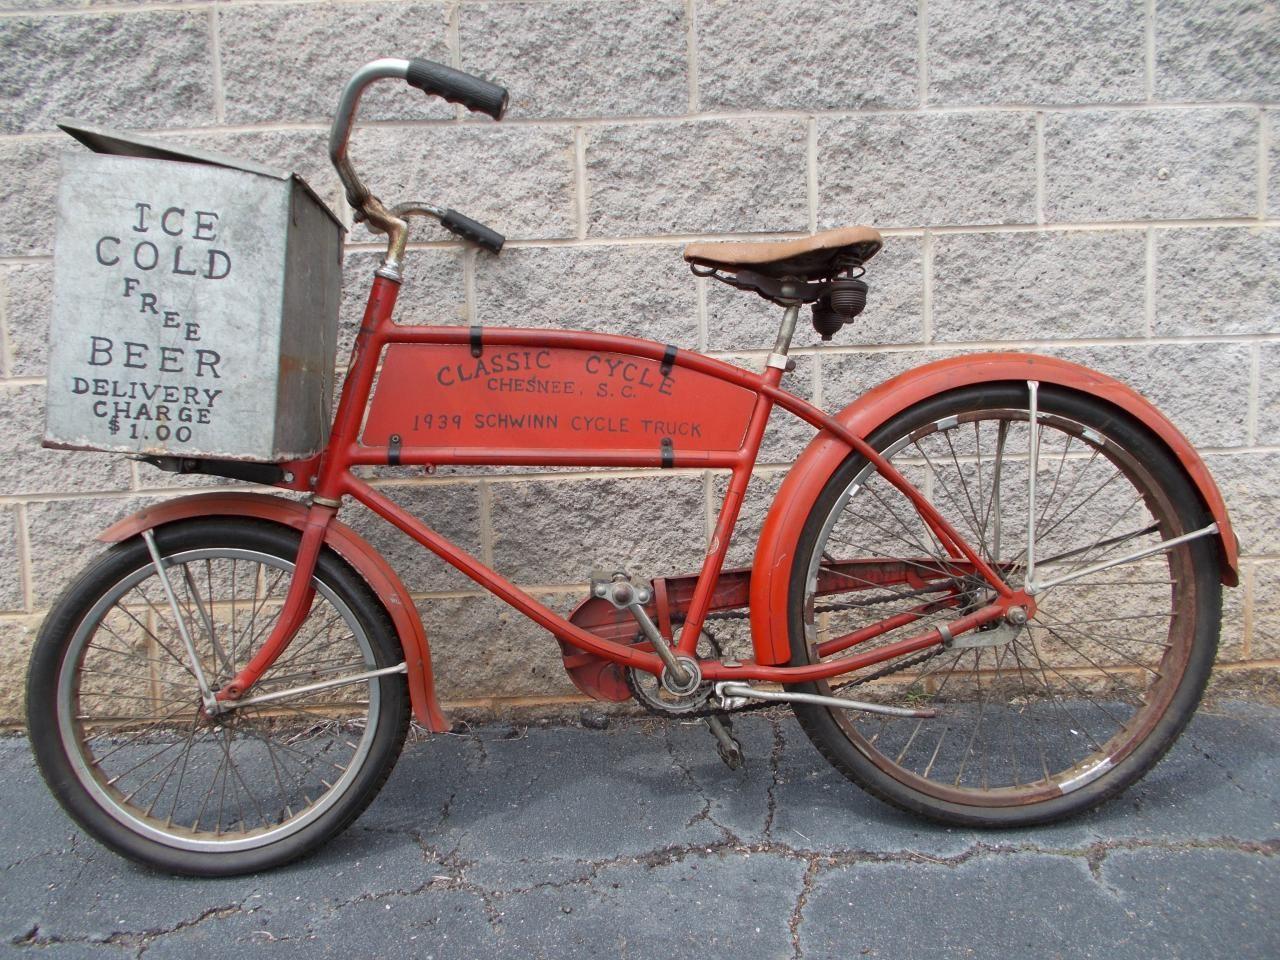 1939 Schwinn Cycle Truck For Sale 500 00 Schwinn Antique